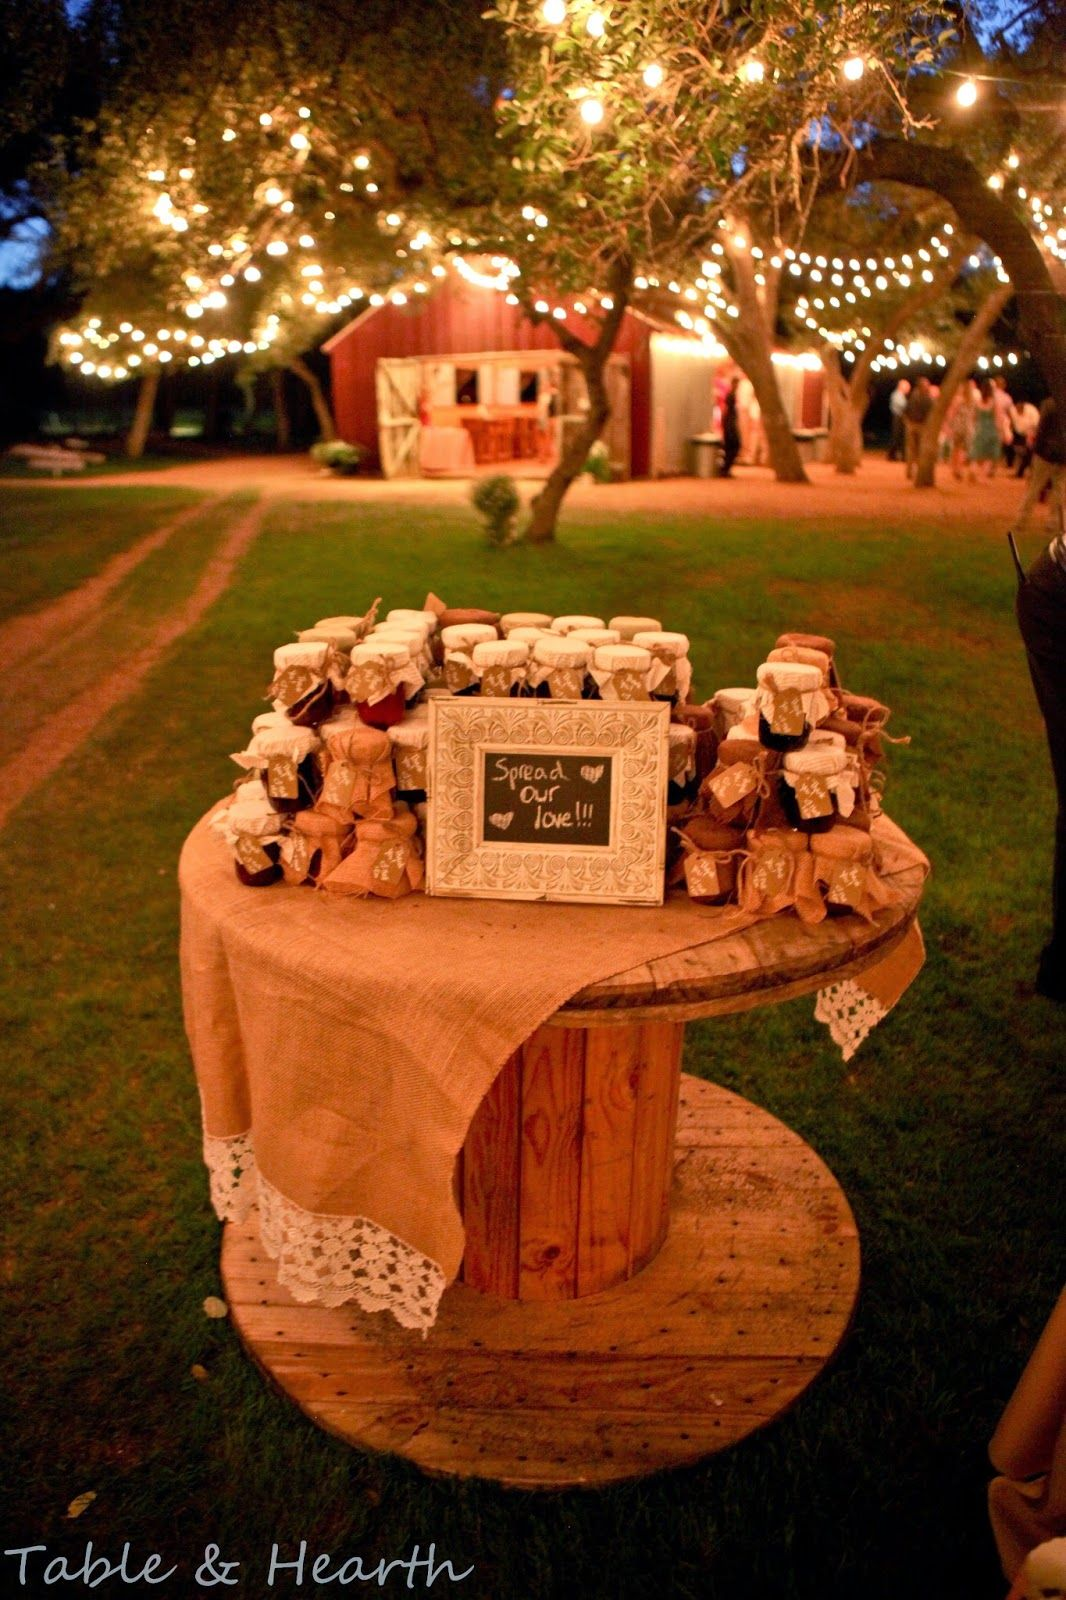 diy rustic wedding lighting. homemade jam favors at rustic wedding reception, displayed on wooden spool - table \u0026 hearth diy lighting